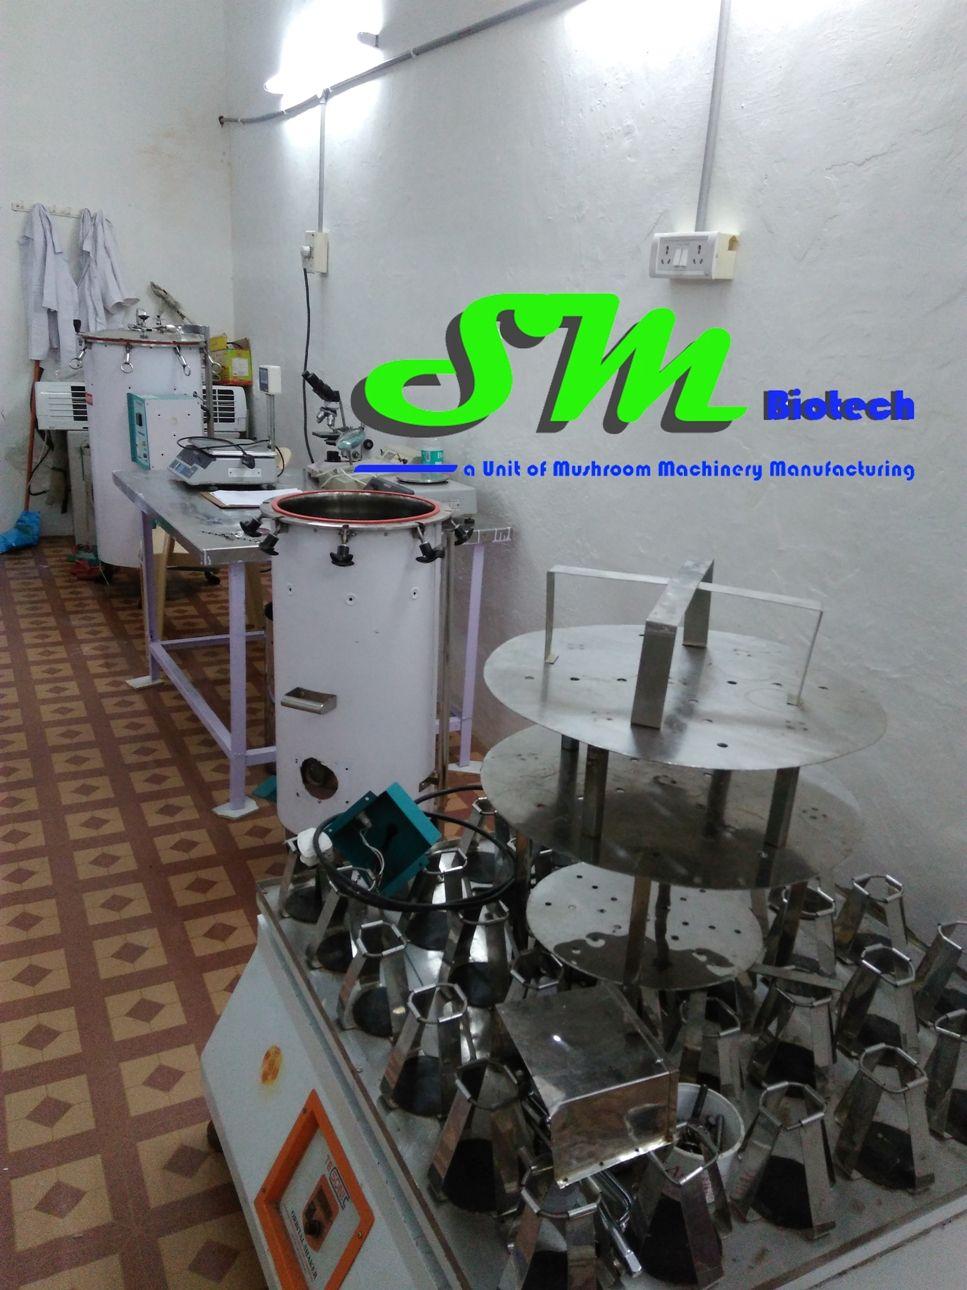 Spawn Lab Machines Setup Industrial sheds, Laboratory